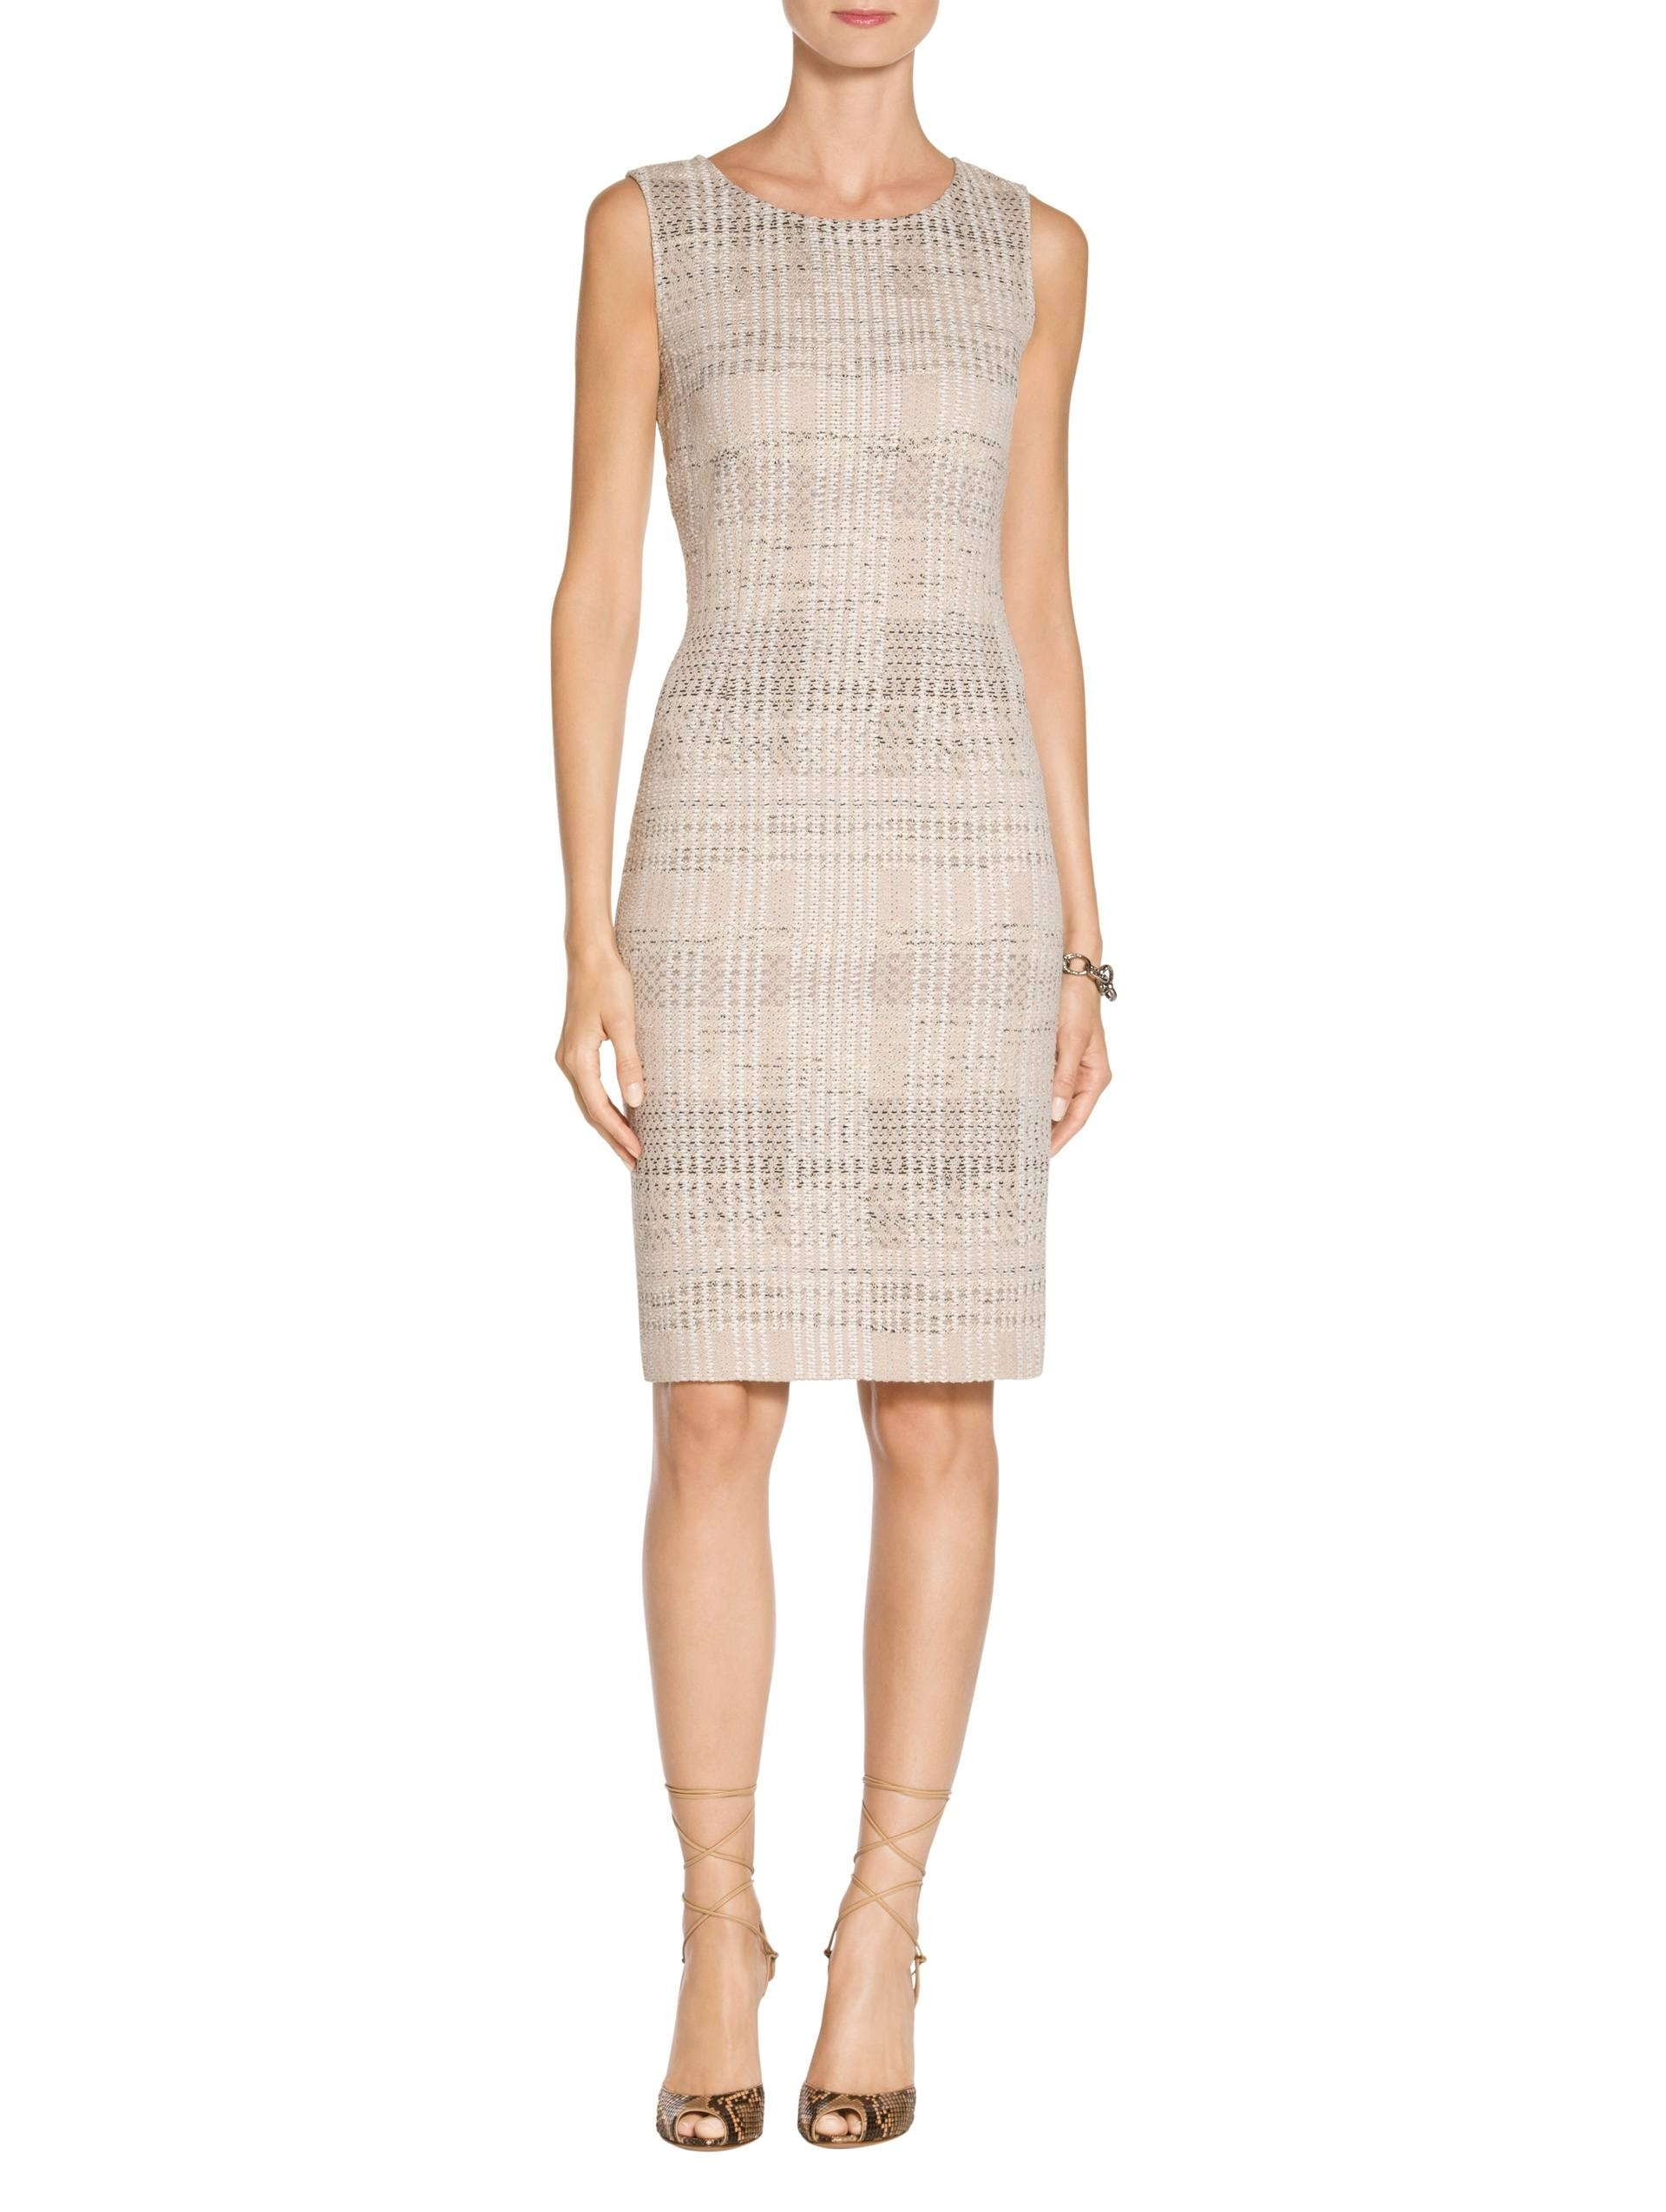 Shop designer dresses on sale st john knits lara knit dress ombrellifo Images